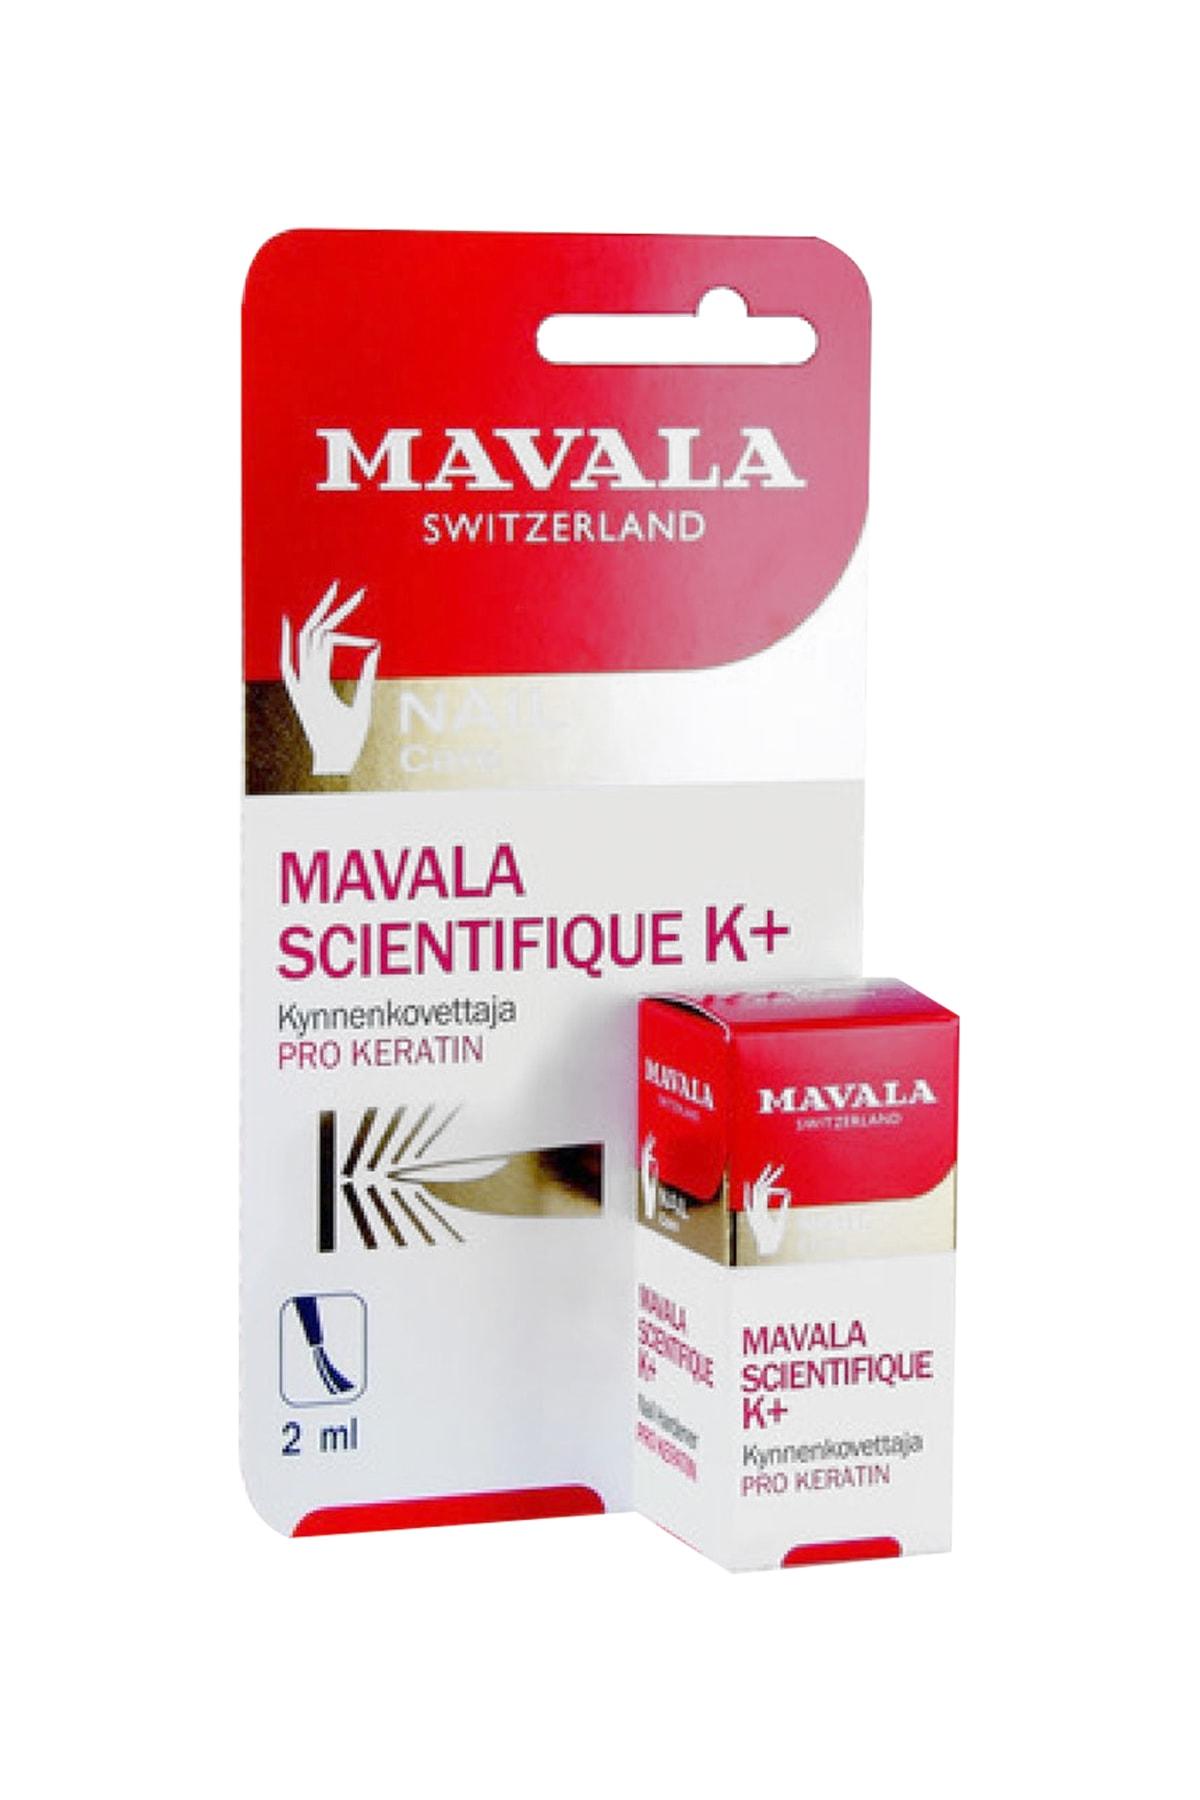 Scientifique K+ Pro Keratin Tırnak Sertleştirici 2 ml 7618900995611